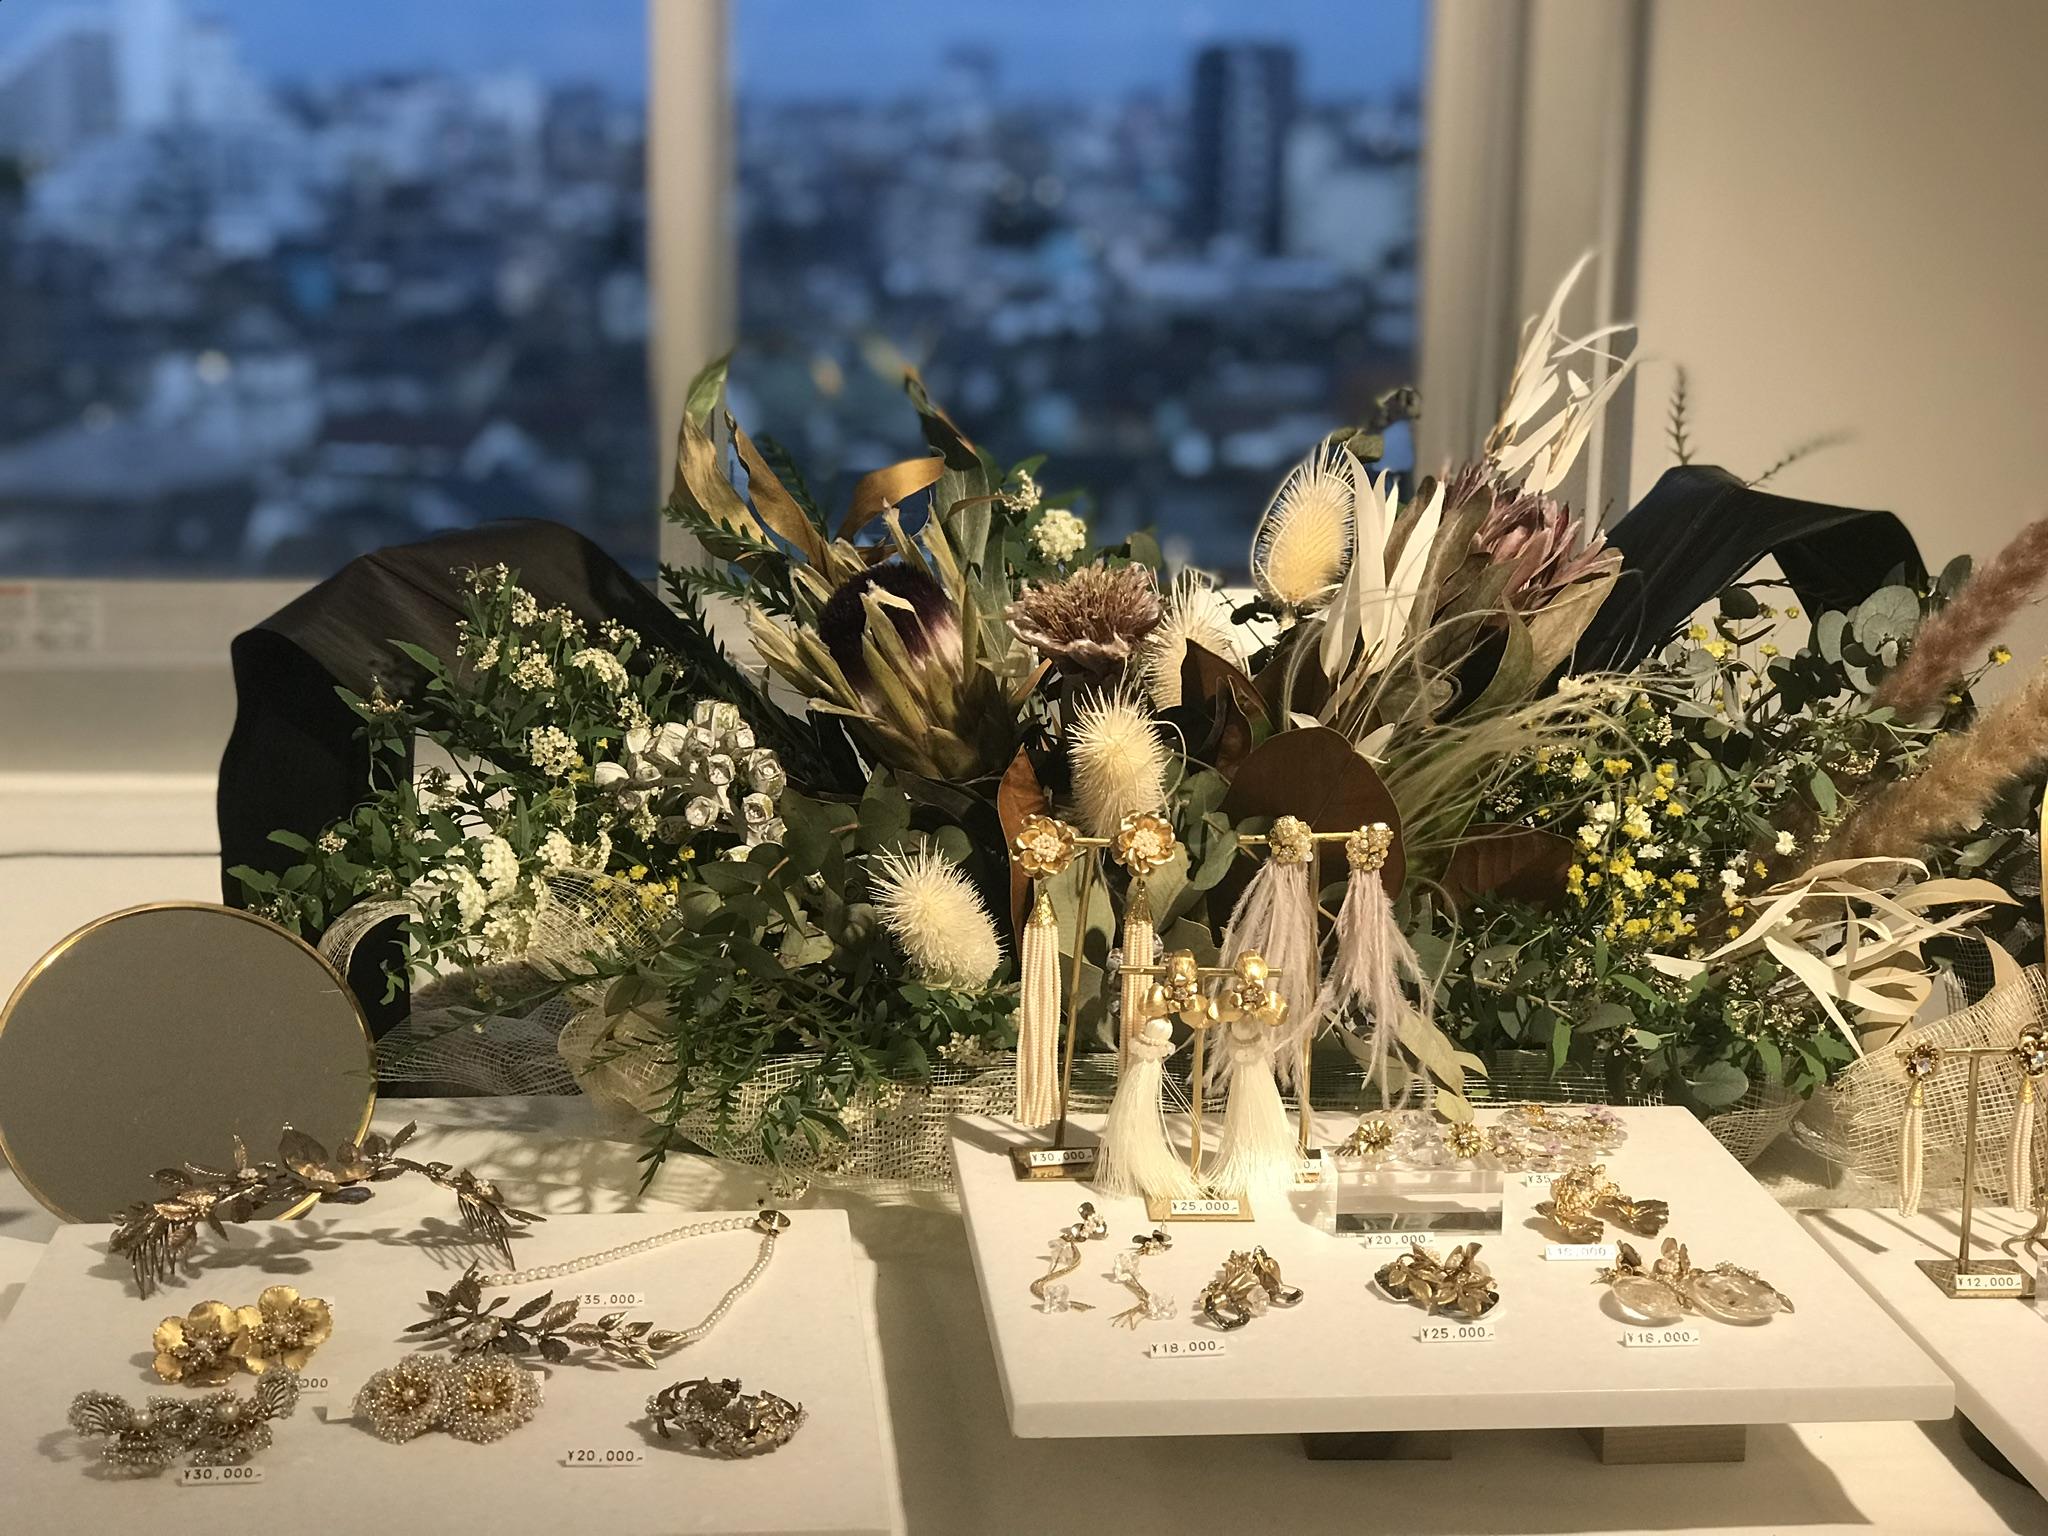 newjewelry next spring 2019